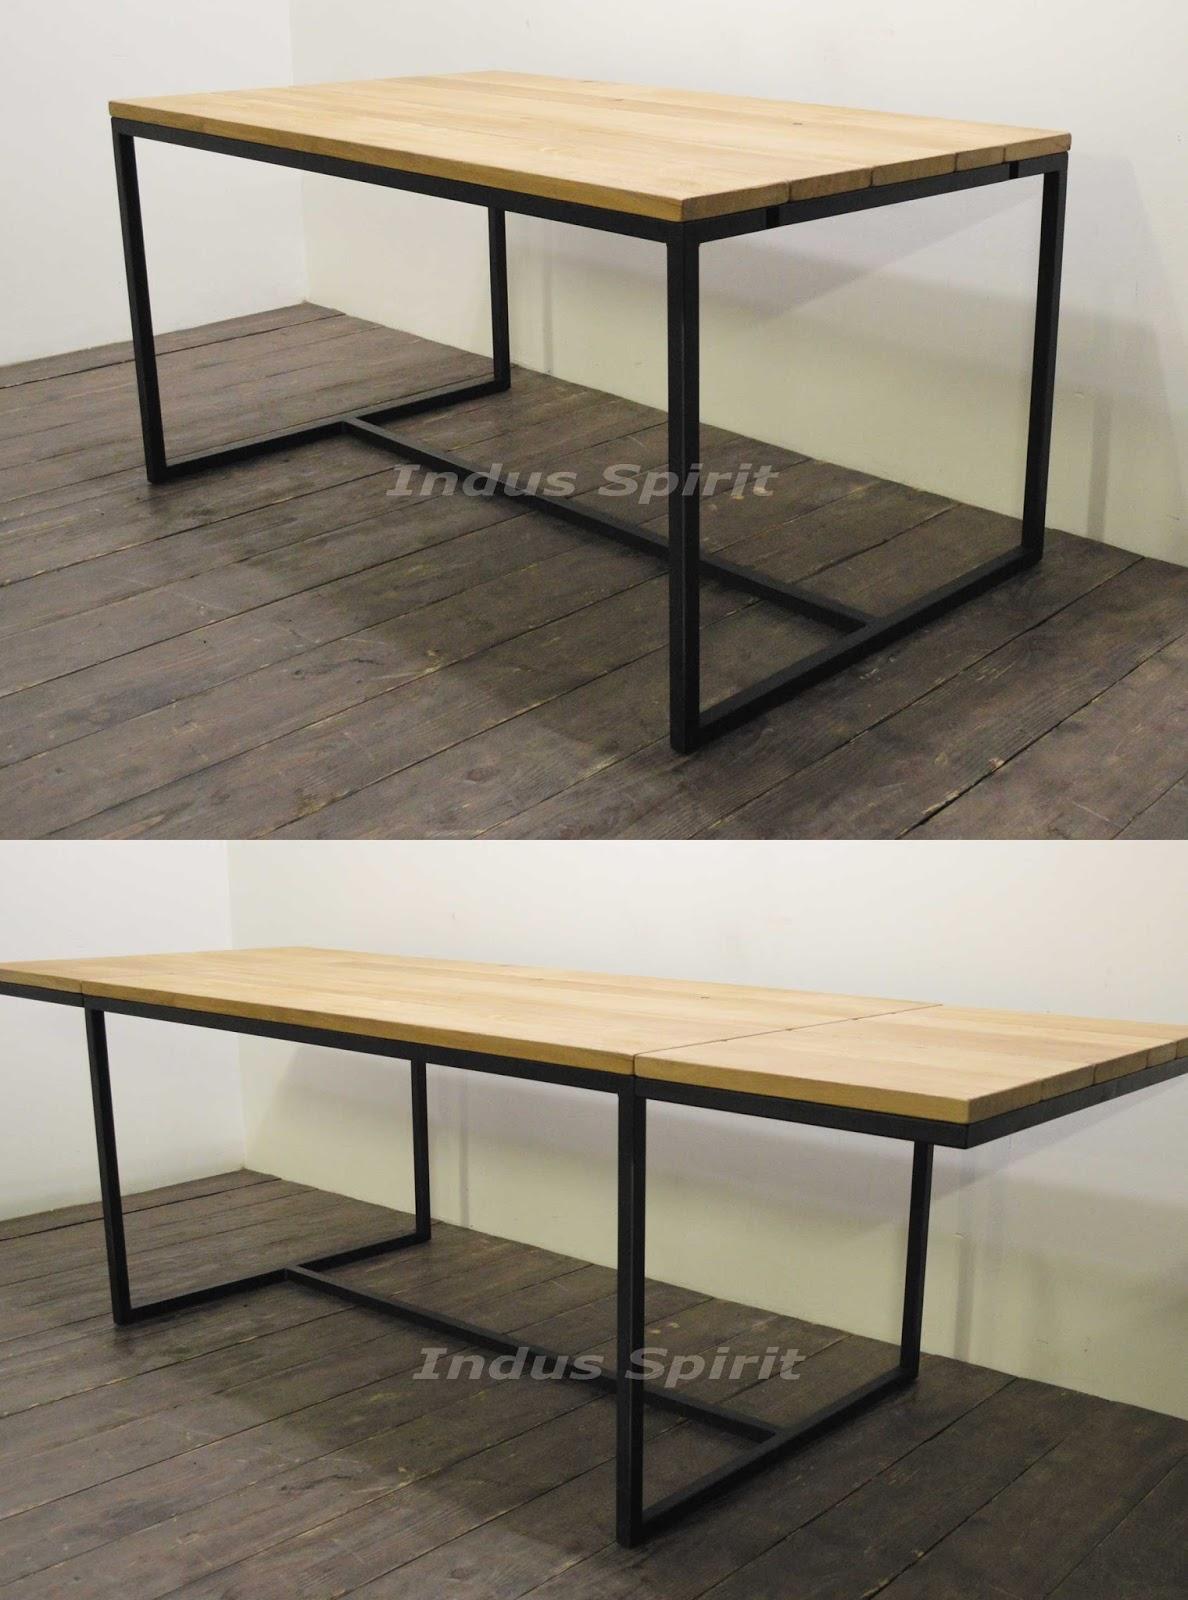 mobilier industriel sur mesure. Black Bedroom Furniture Sets. Home Design Ideas